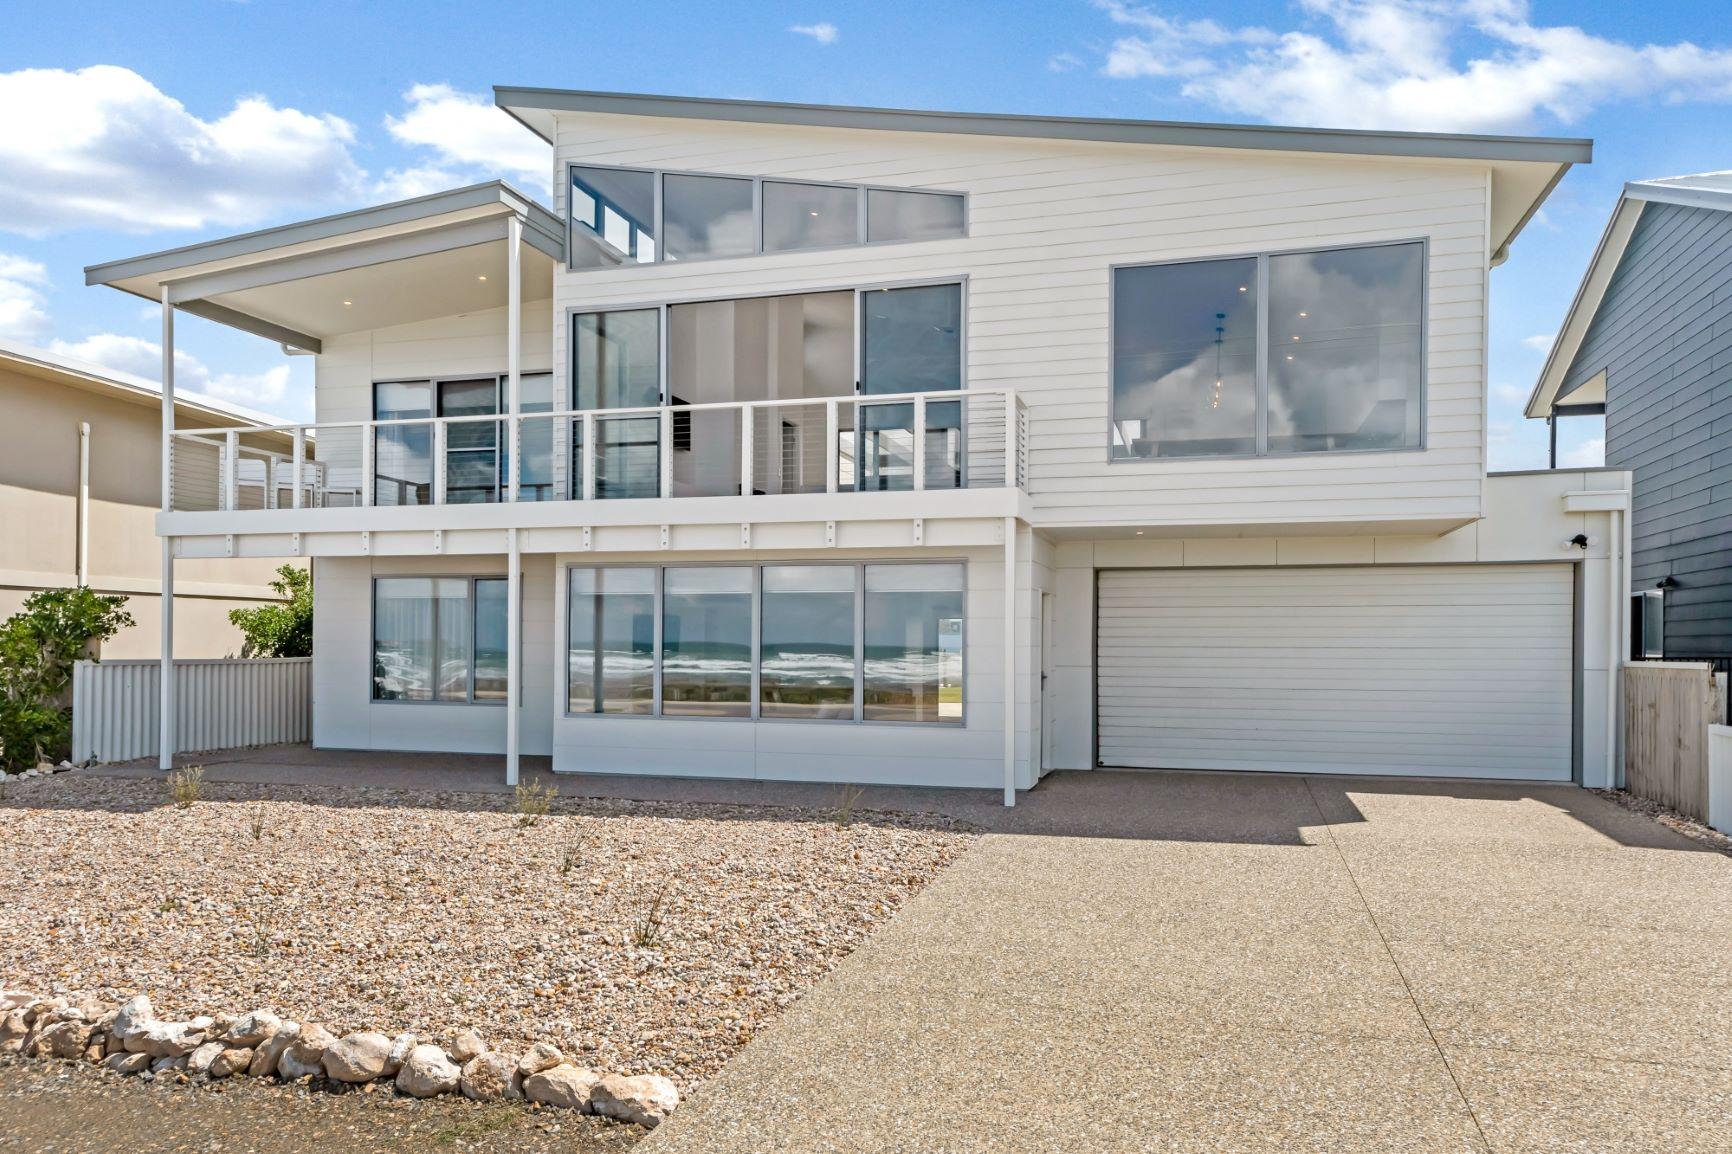 Family Home, Custom Home, New Home, Two Storey, Builders, Design, Middleton SA, Fleureiu, Roller Door, Balustrades, Large Windows